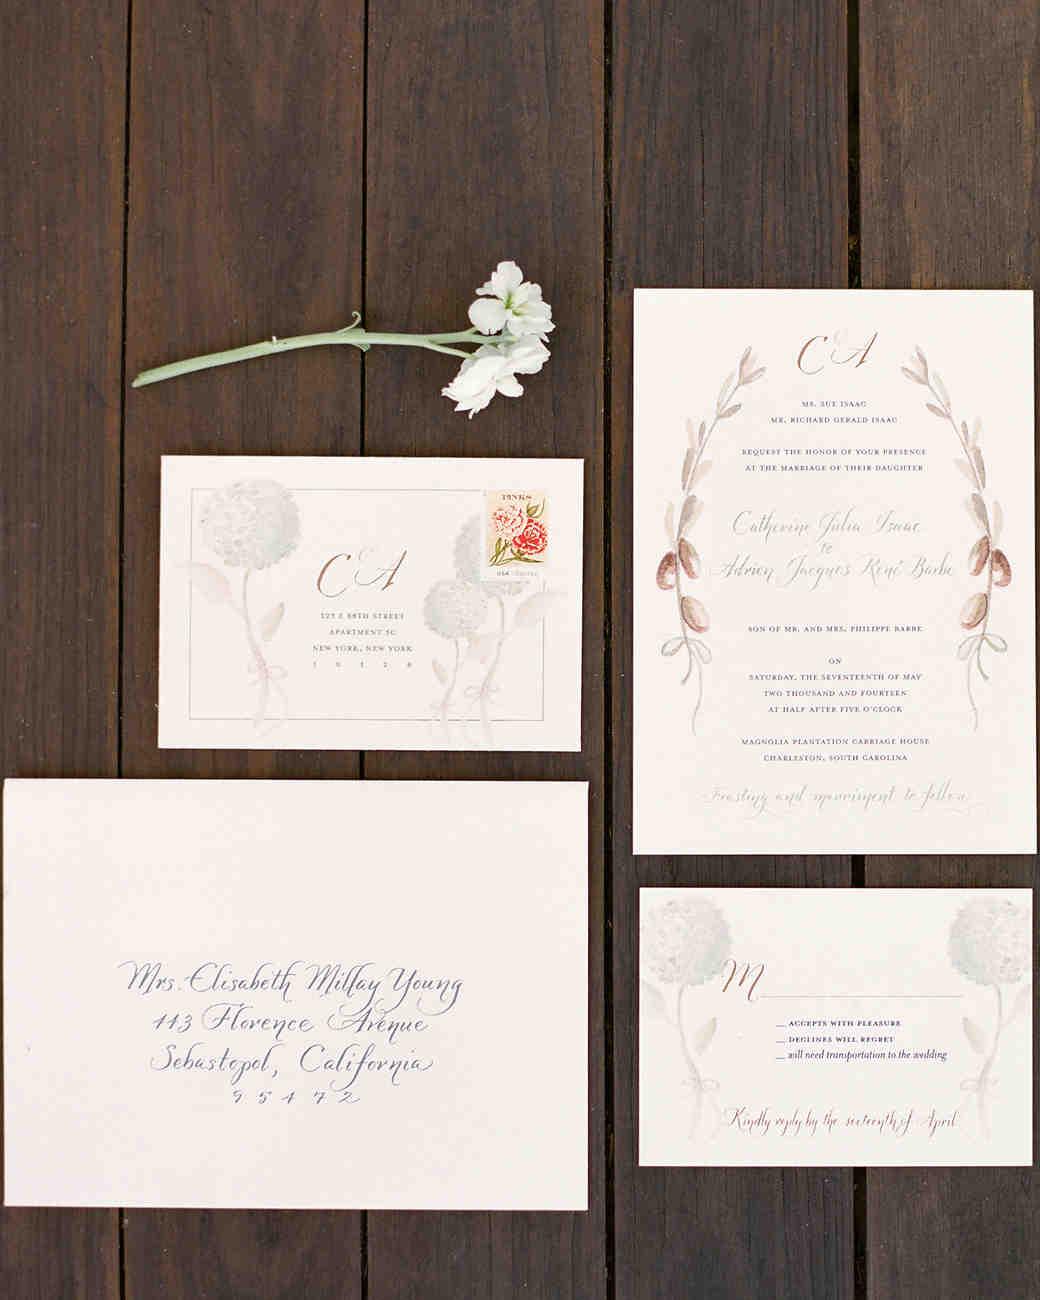 catherine-adrien-wedding-stationery-0215-s111414-0814.jpg